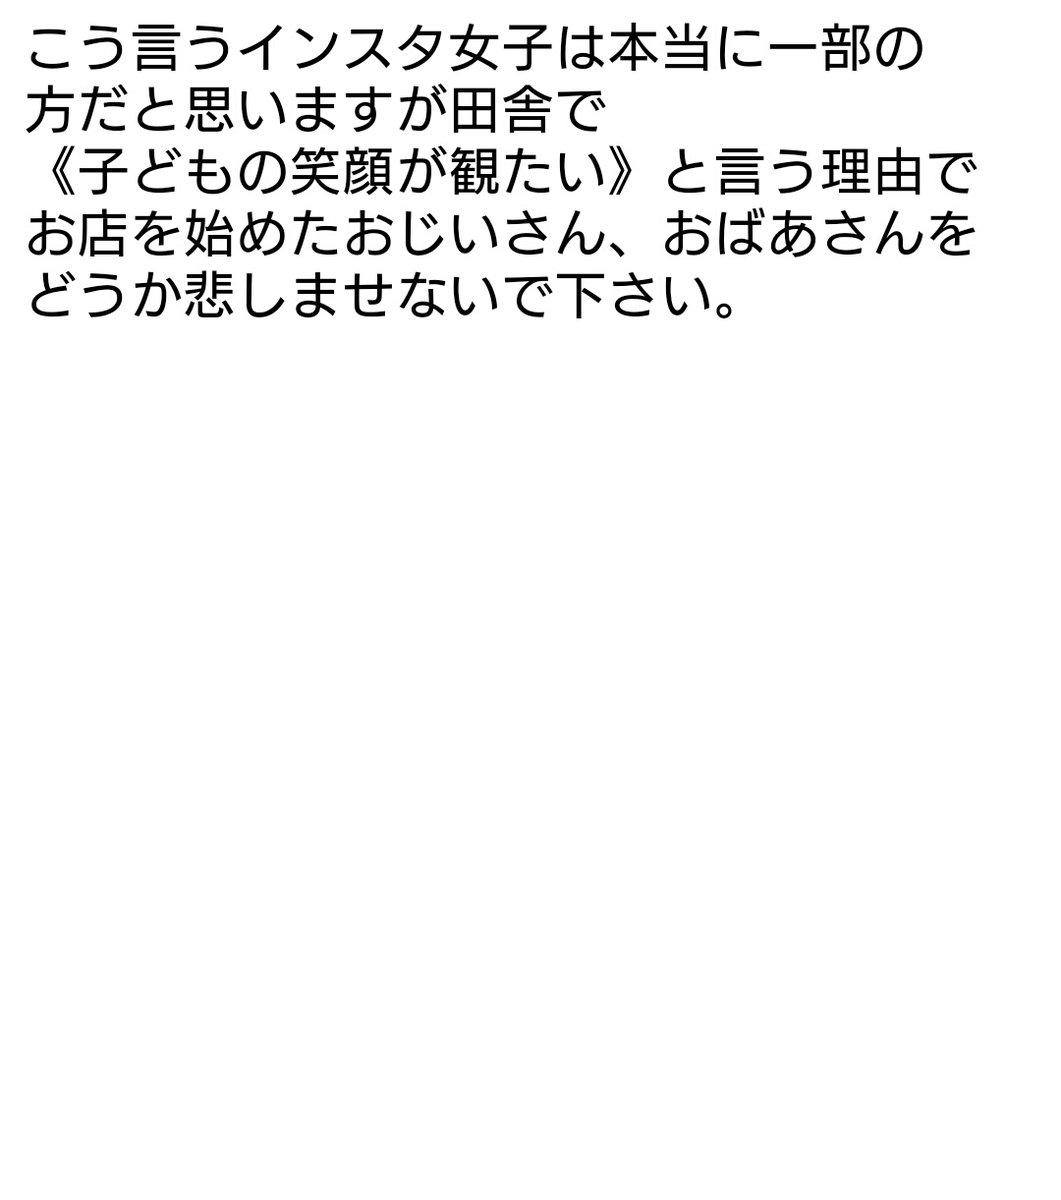 DQGBq30UMAAhF66.jpg